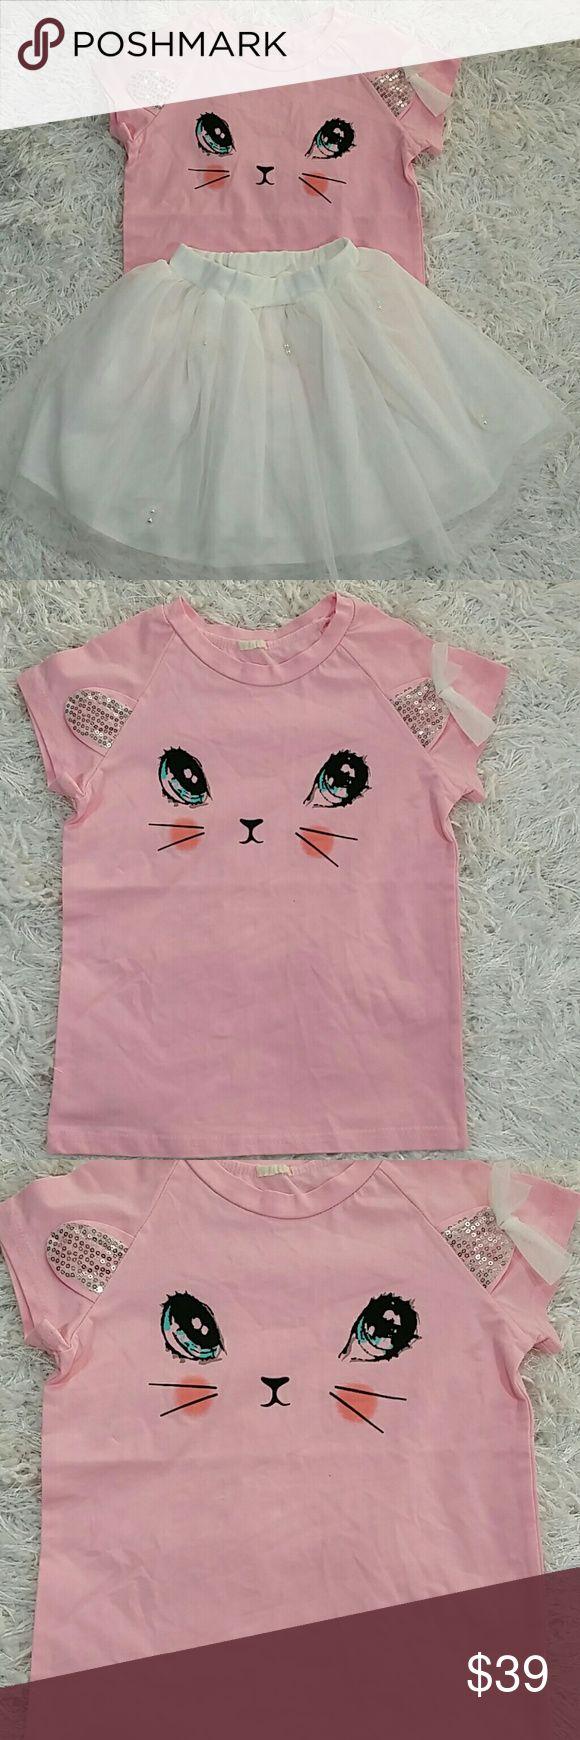 Shirt design app for pc - Pink And White 2 Pc Set Kitty Tutu Kids